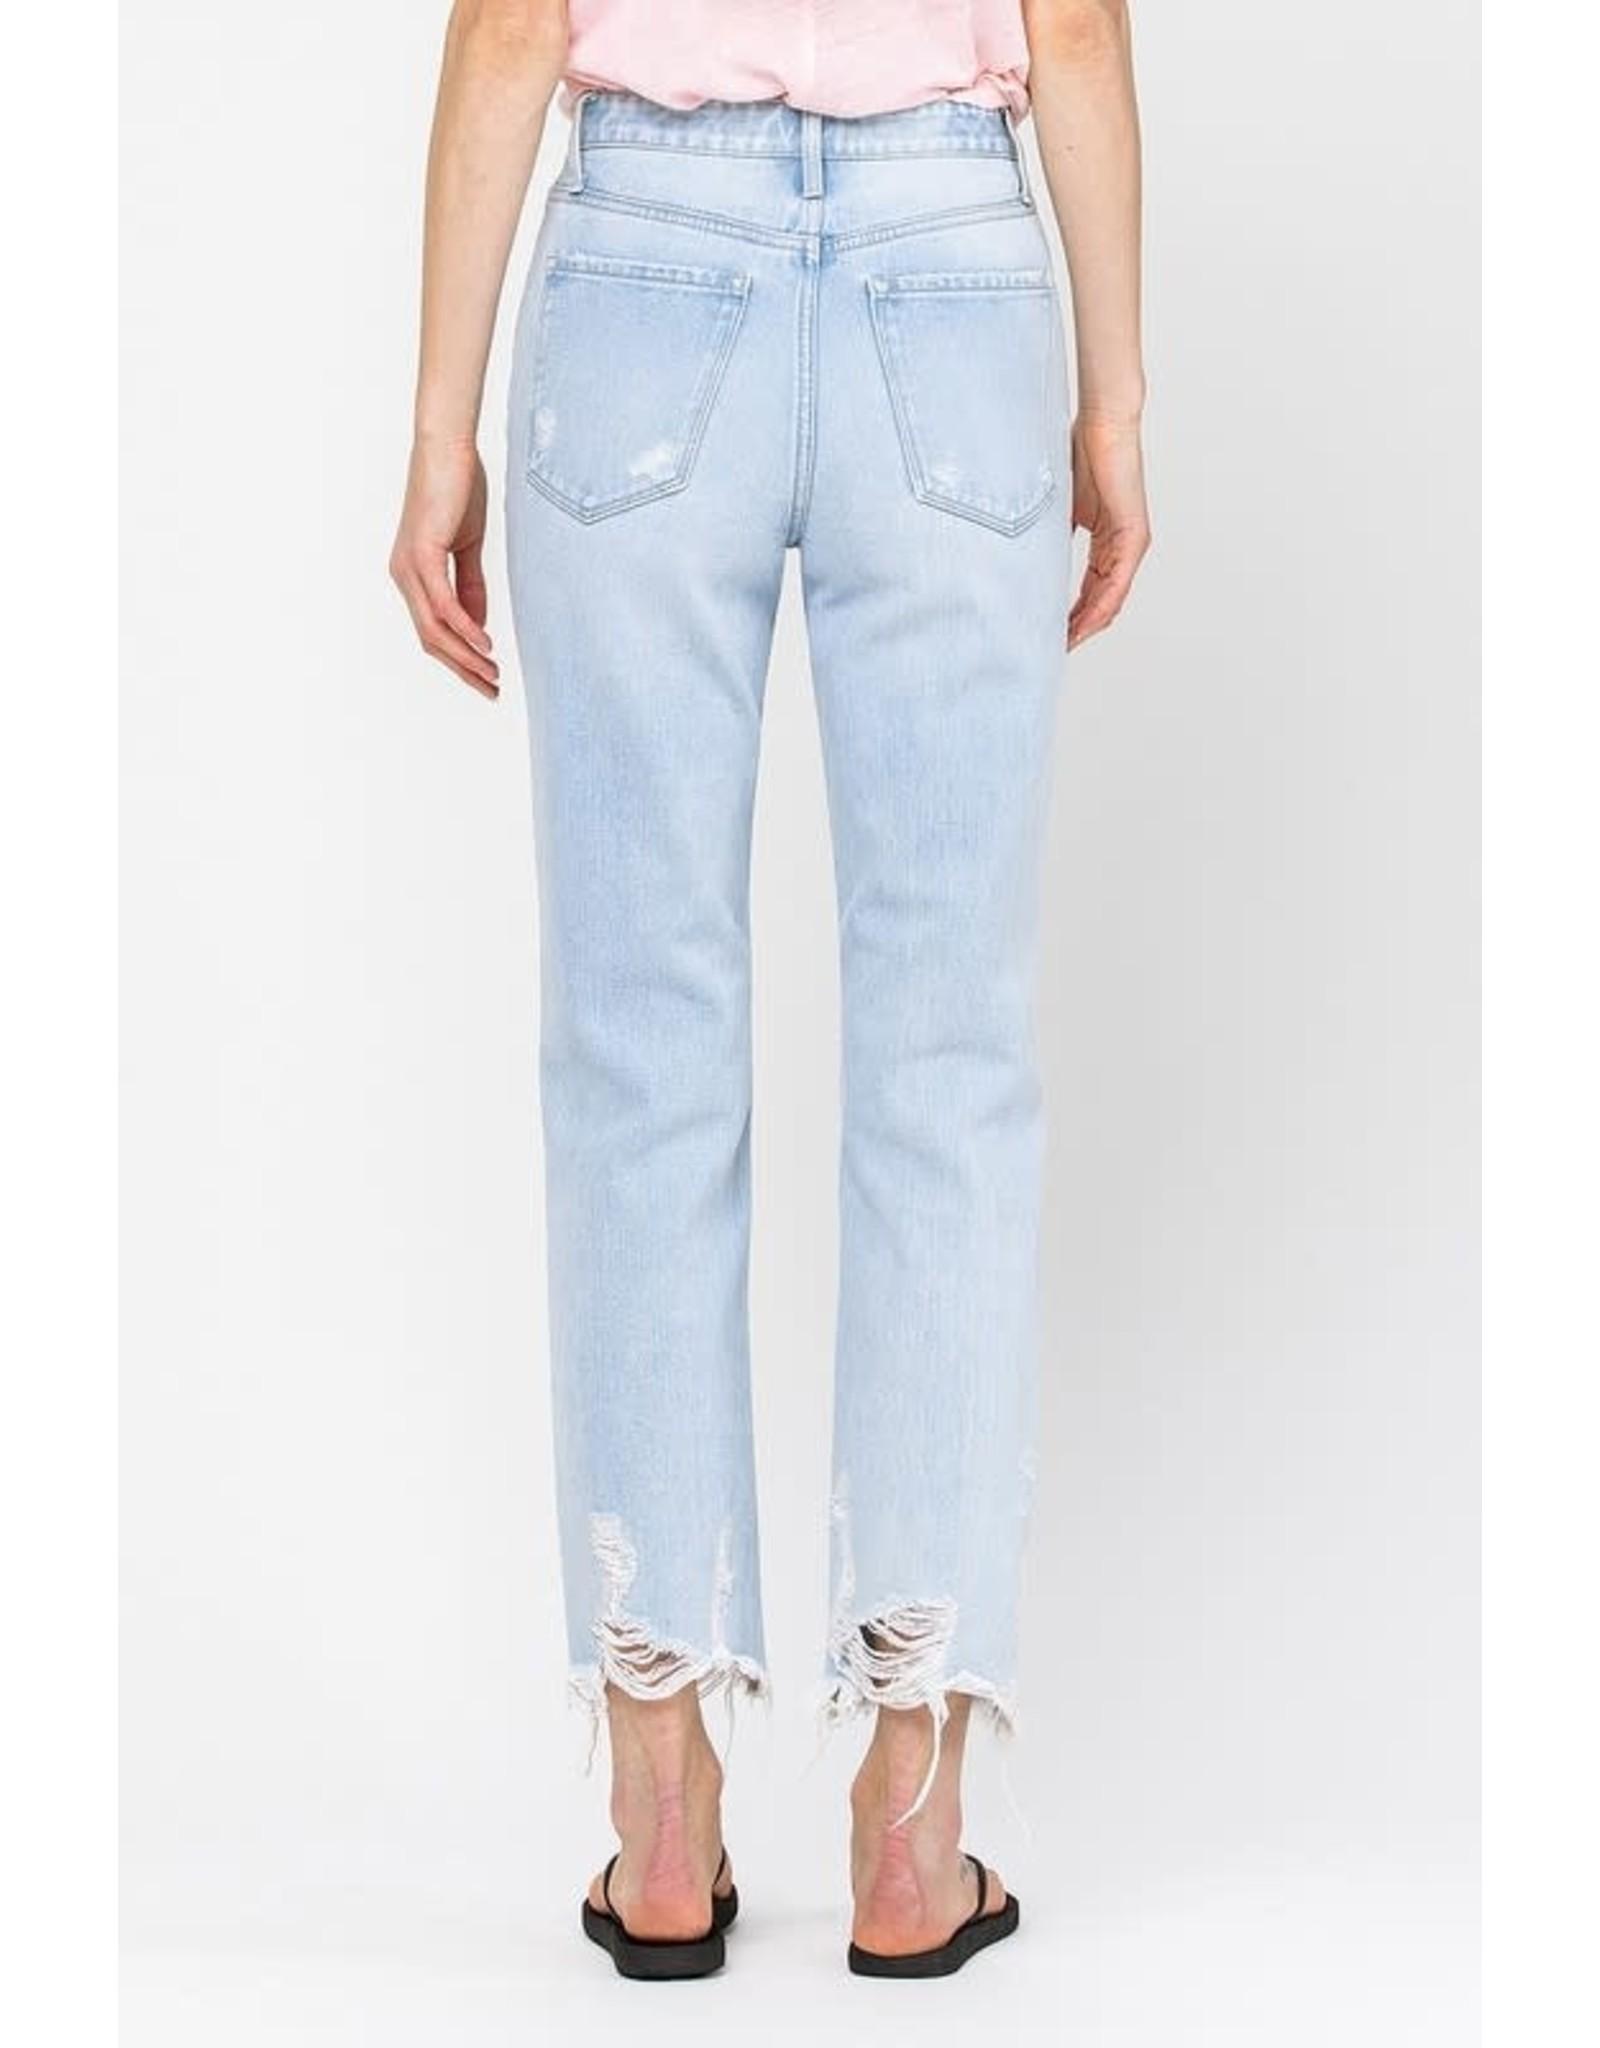 Icy Blue Flying Monkey Distressed Raw Hem Straight Jeans